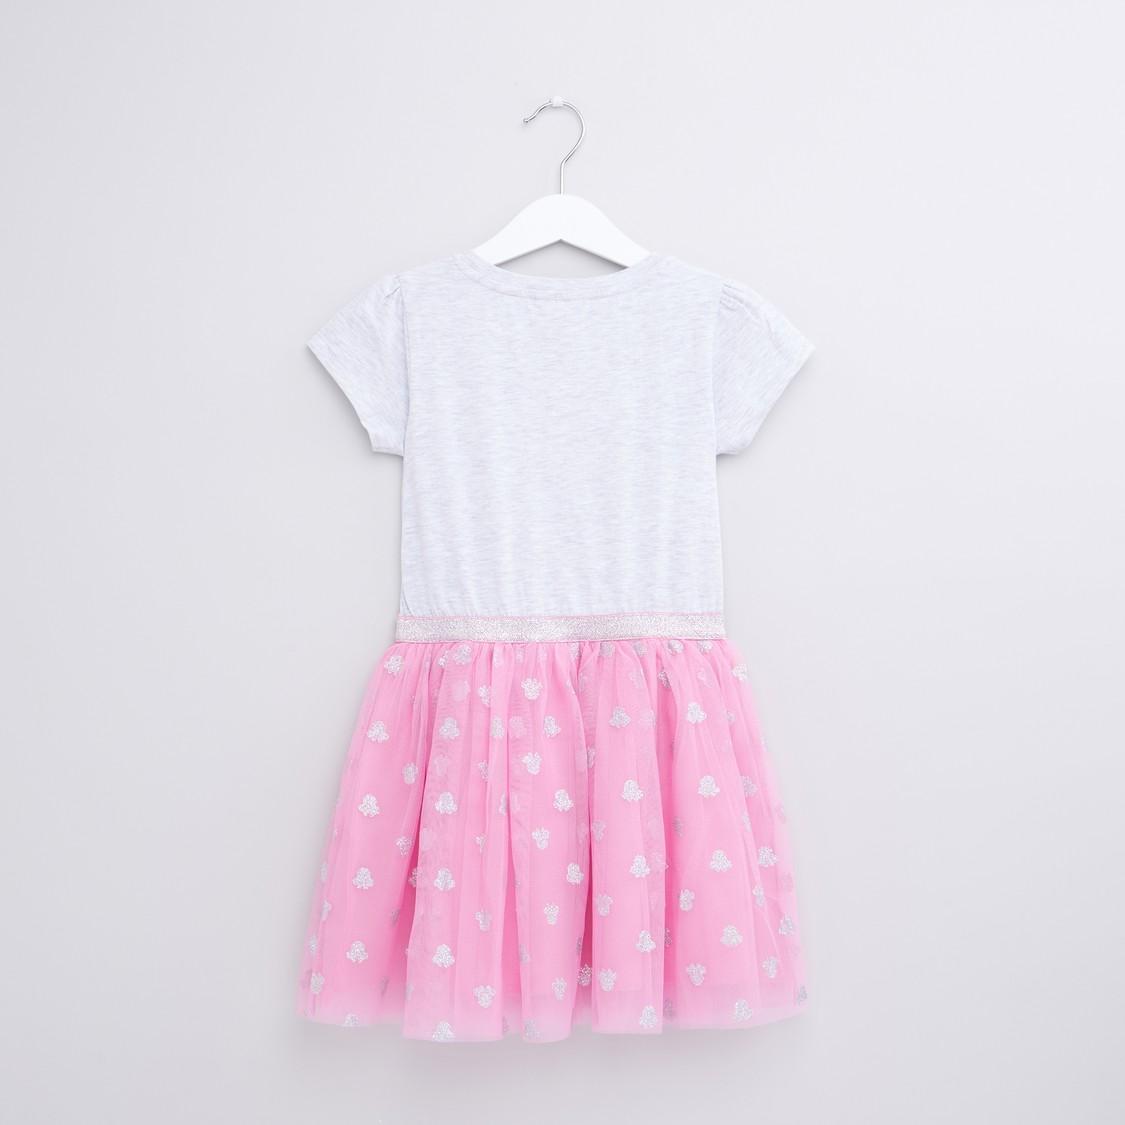 فستان مزيّن بالترتر وطبعات ميني ماوس